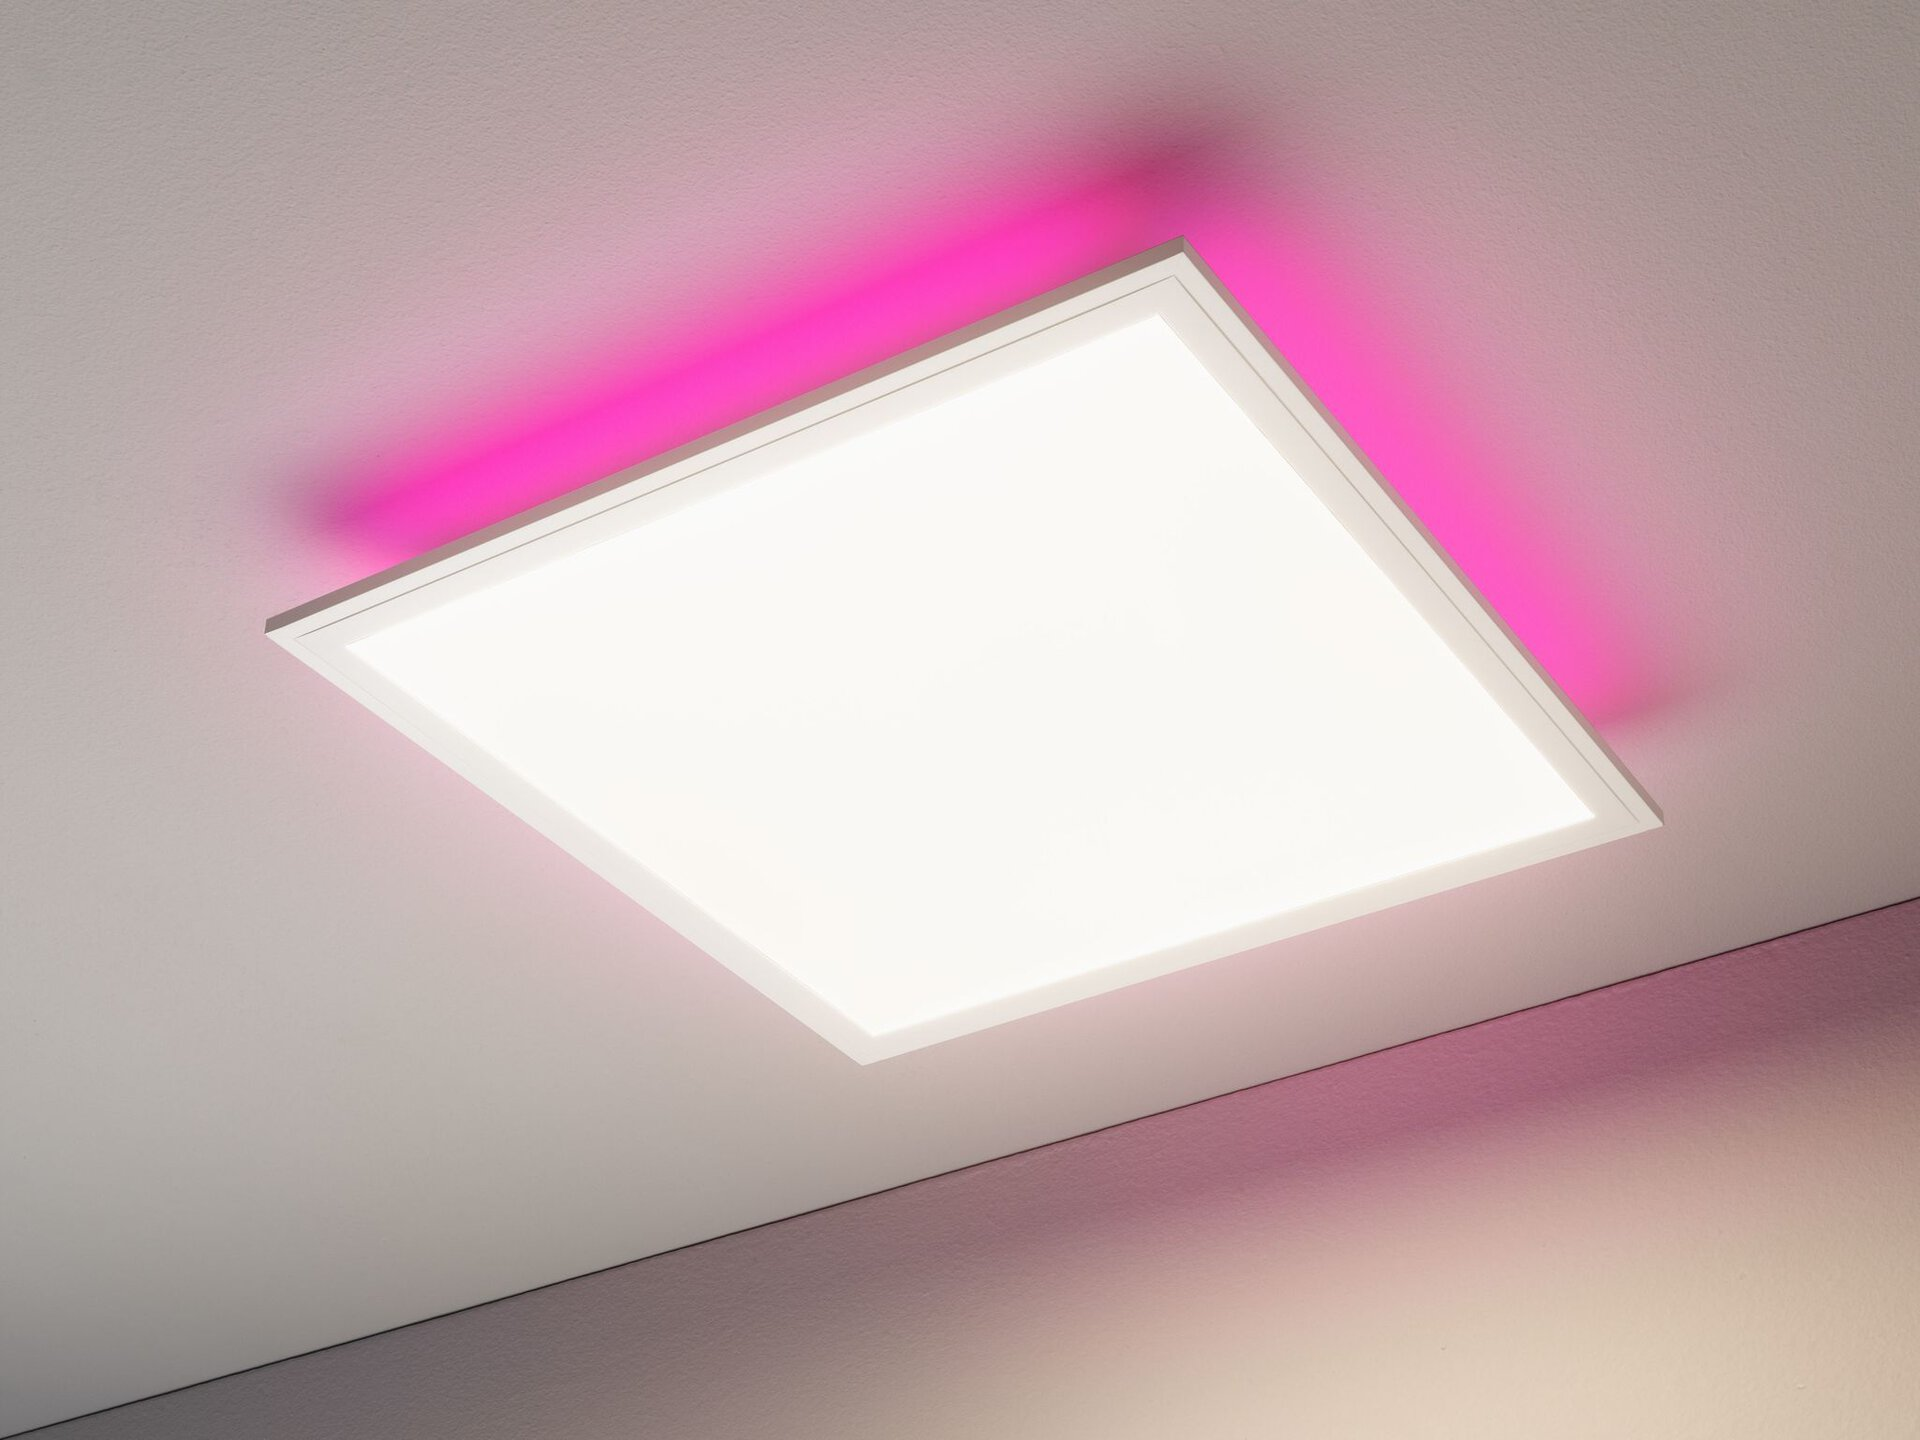 Deckenleuchte Colores + Casa Nova Metall weiß 45 x 5 x 45 cm